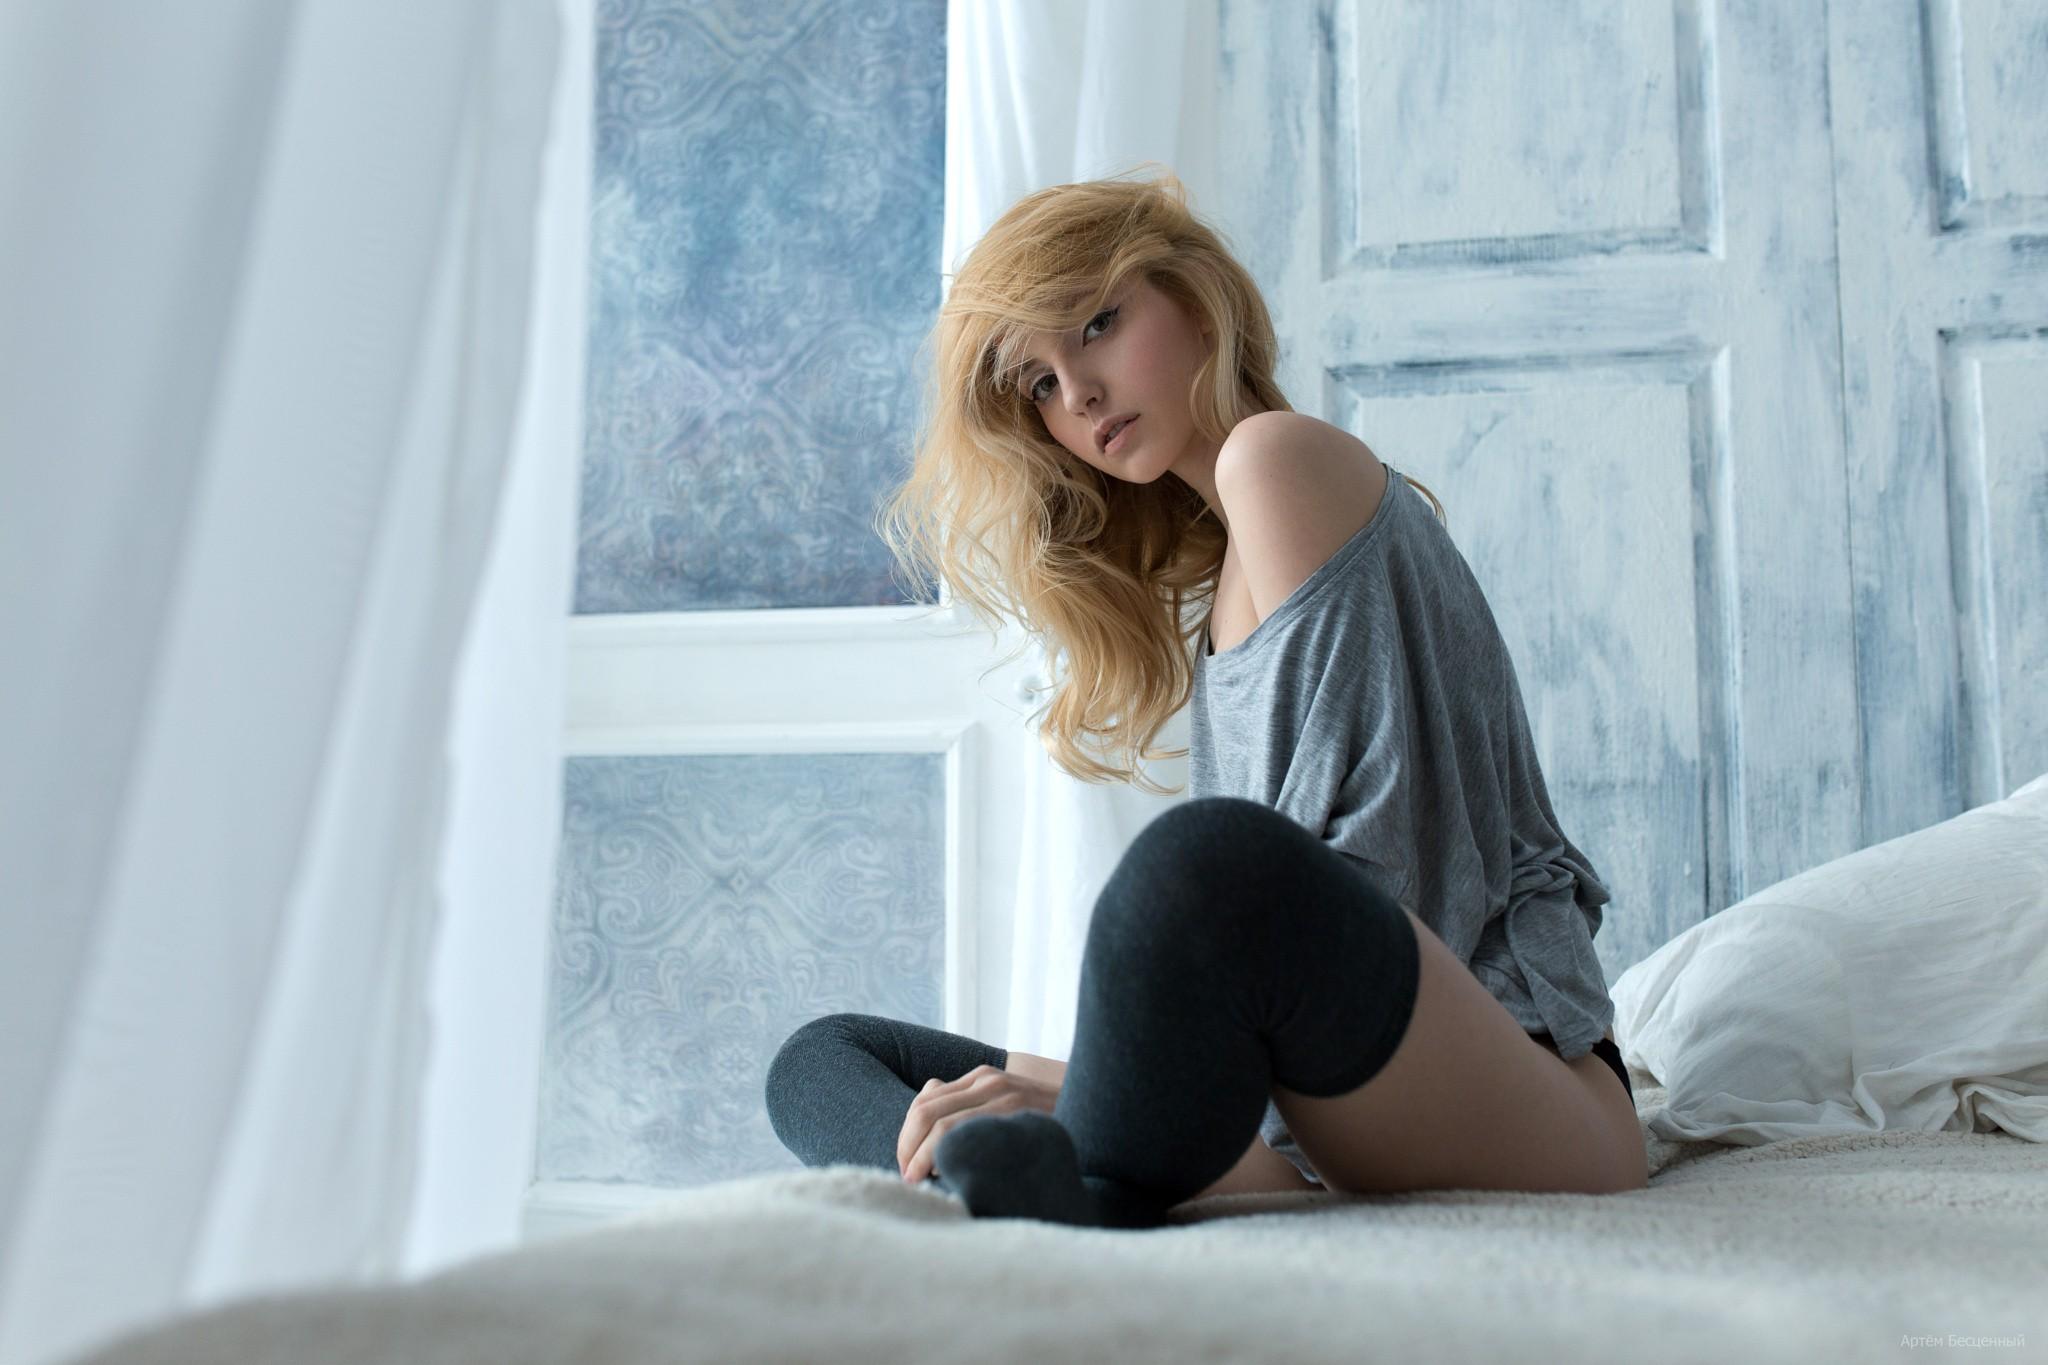 wallpaper : white, women, blonde, long hair, sitting, in bed, dress